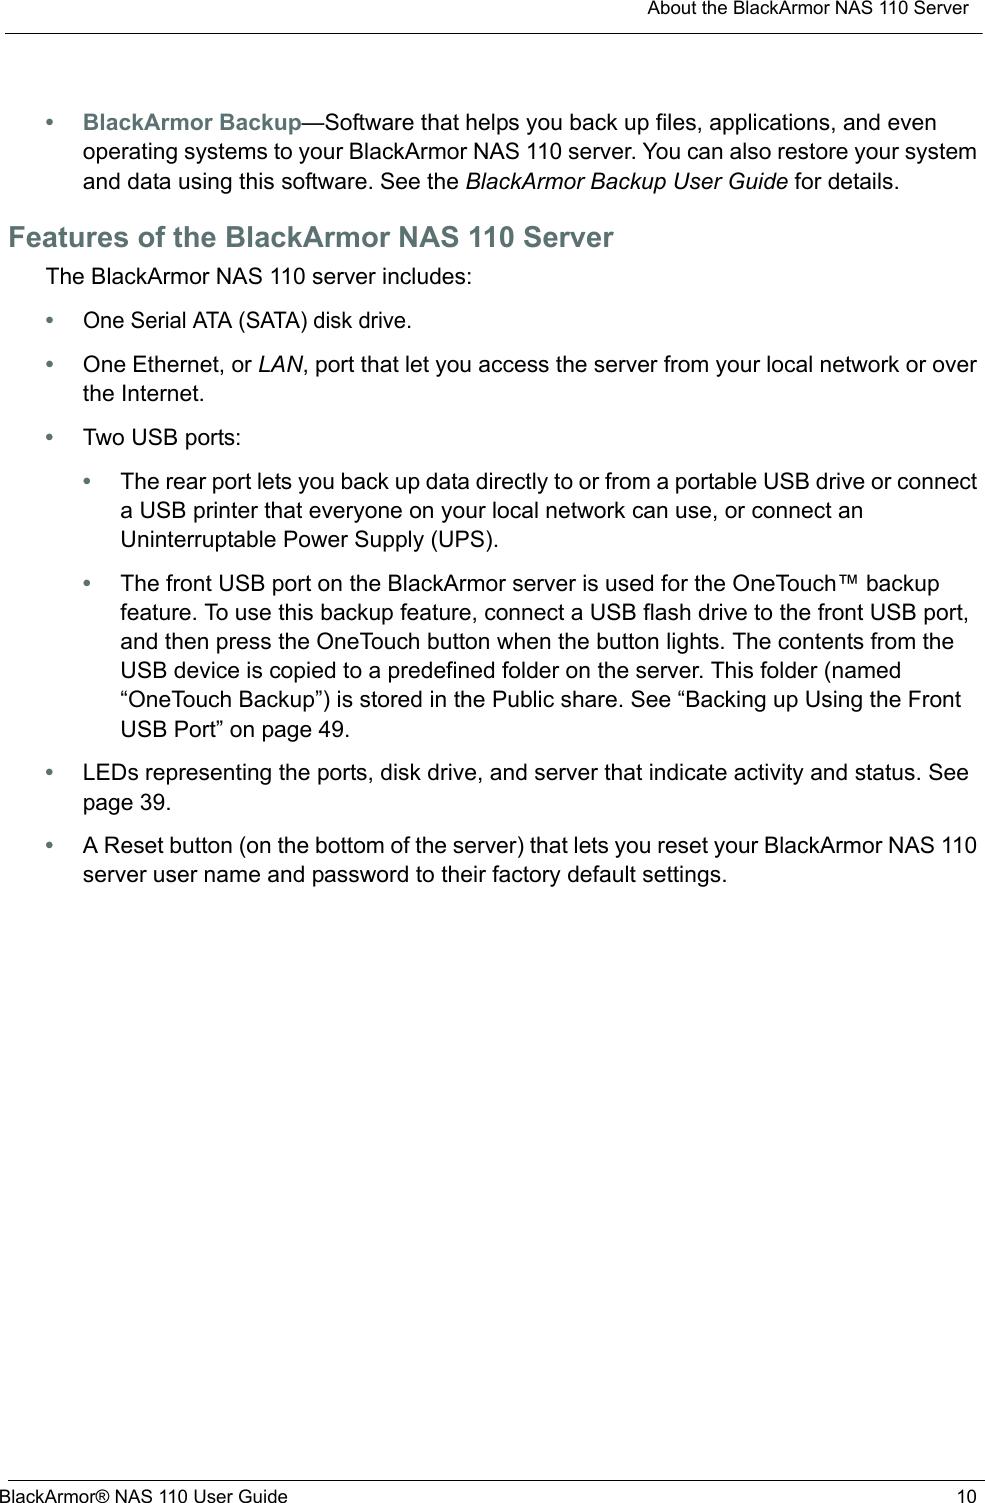 Seagate Blackarmor Nas 110 Users Manual ManualsLib Makes It